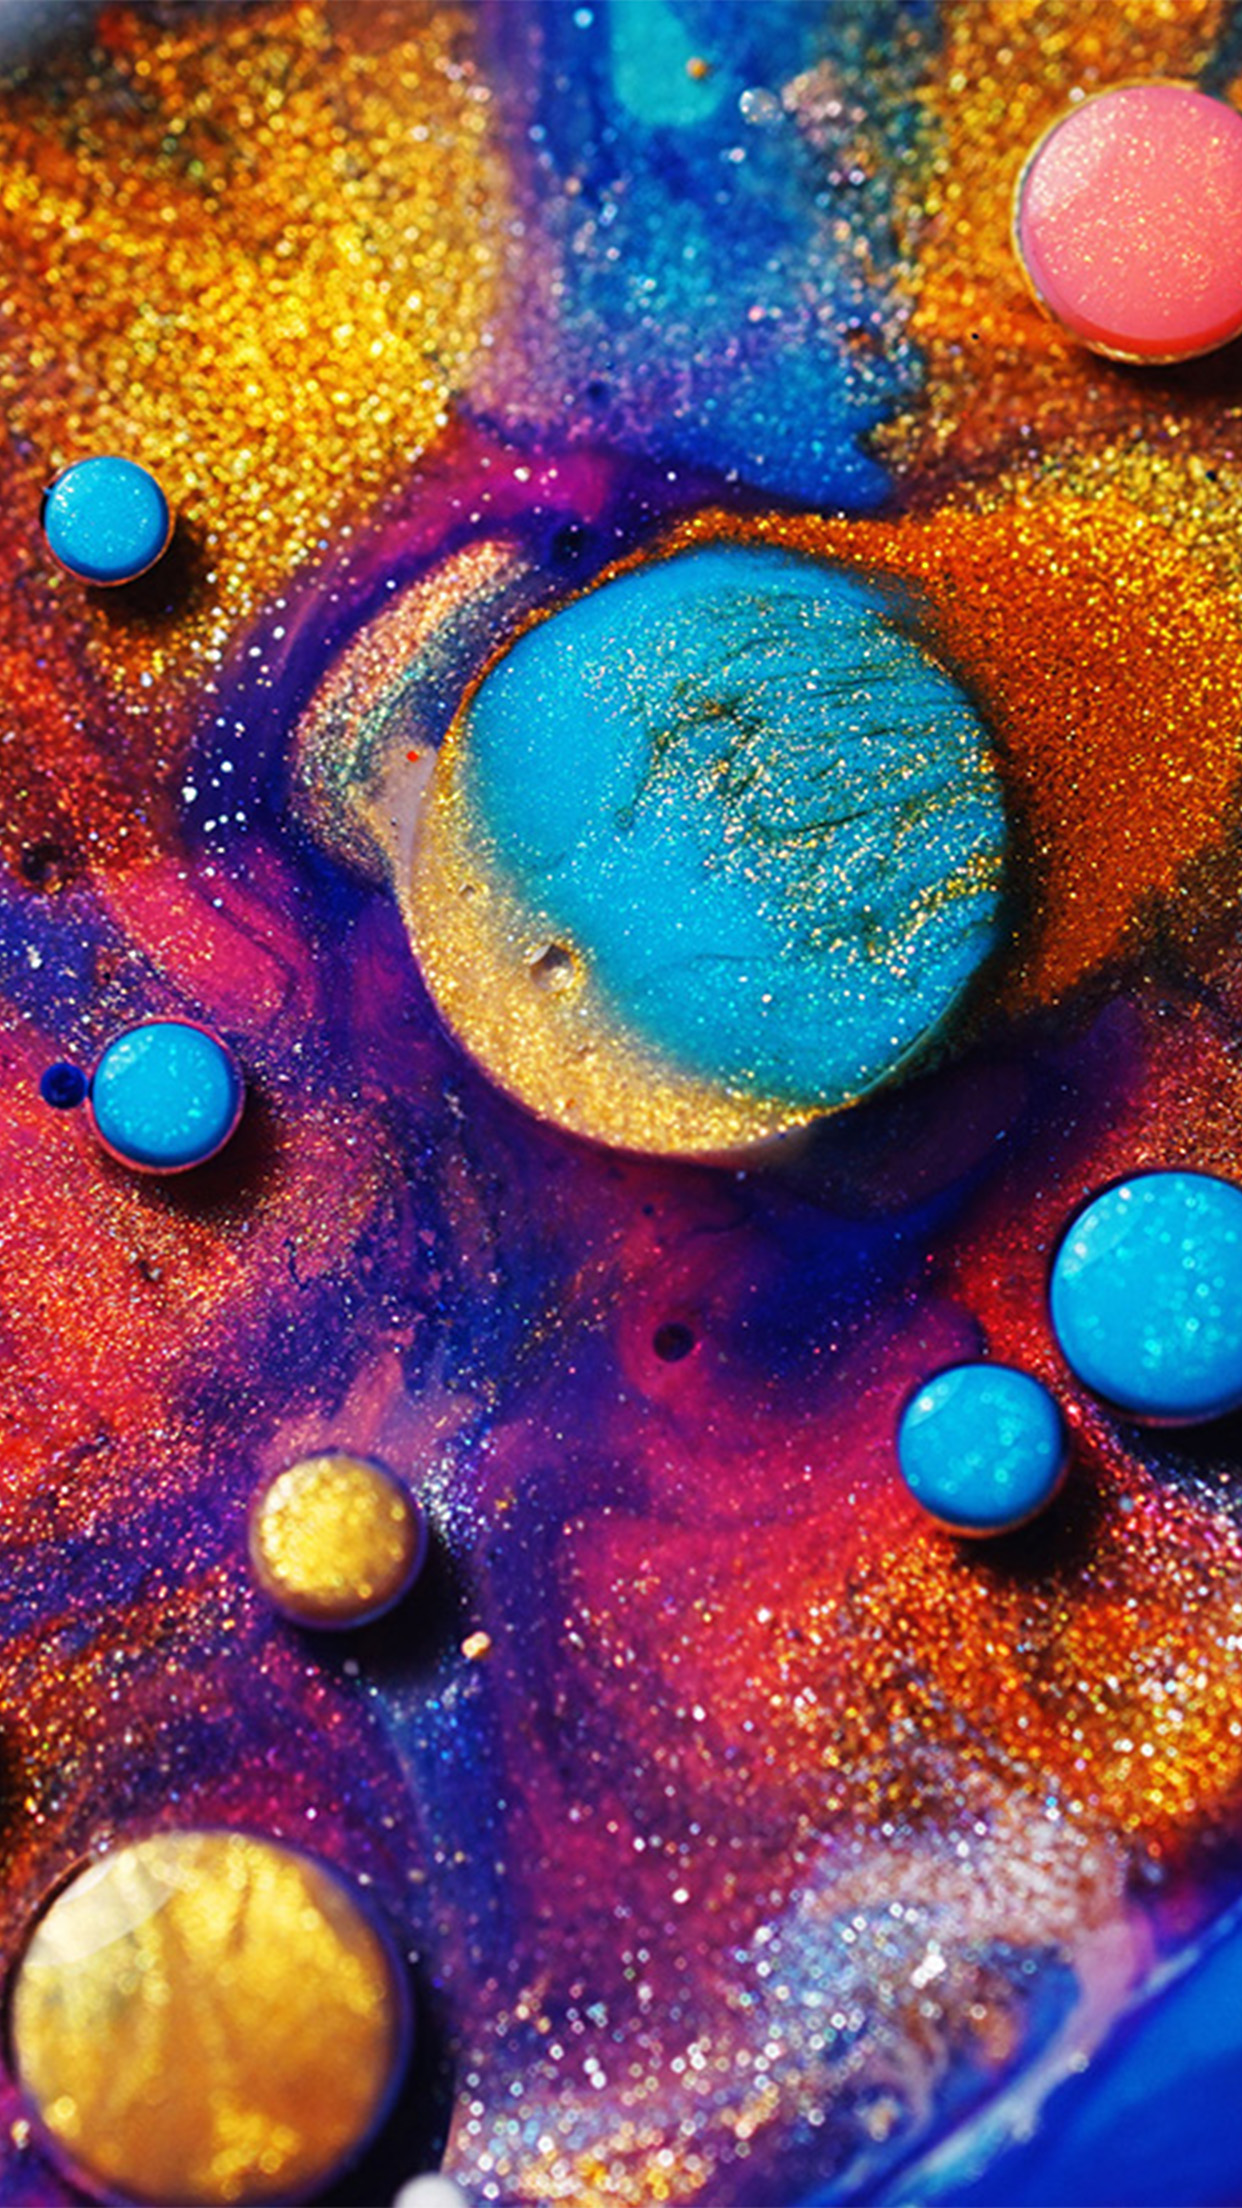 Iphonepapers Com Iphone Wallpaper Vz15 Makeup Color Art